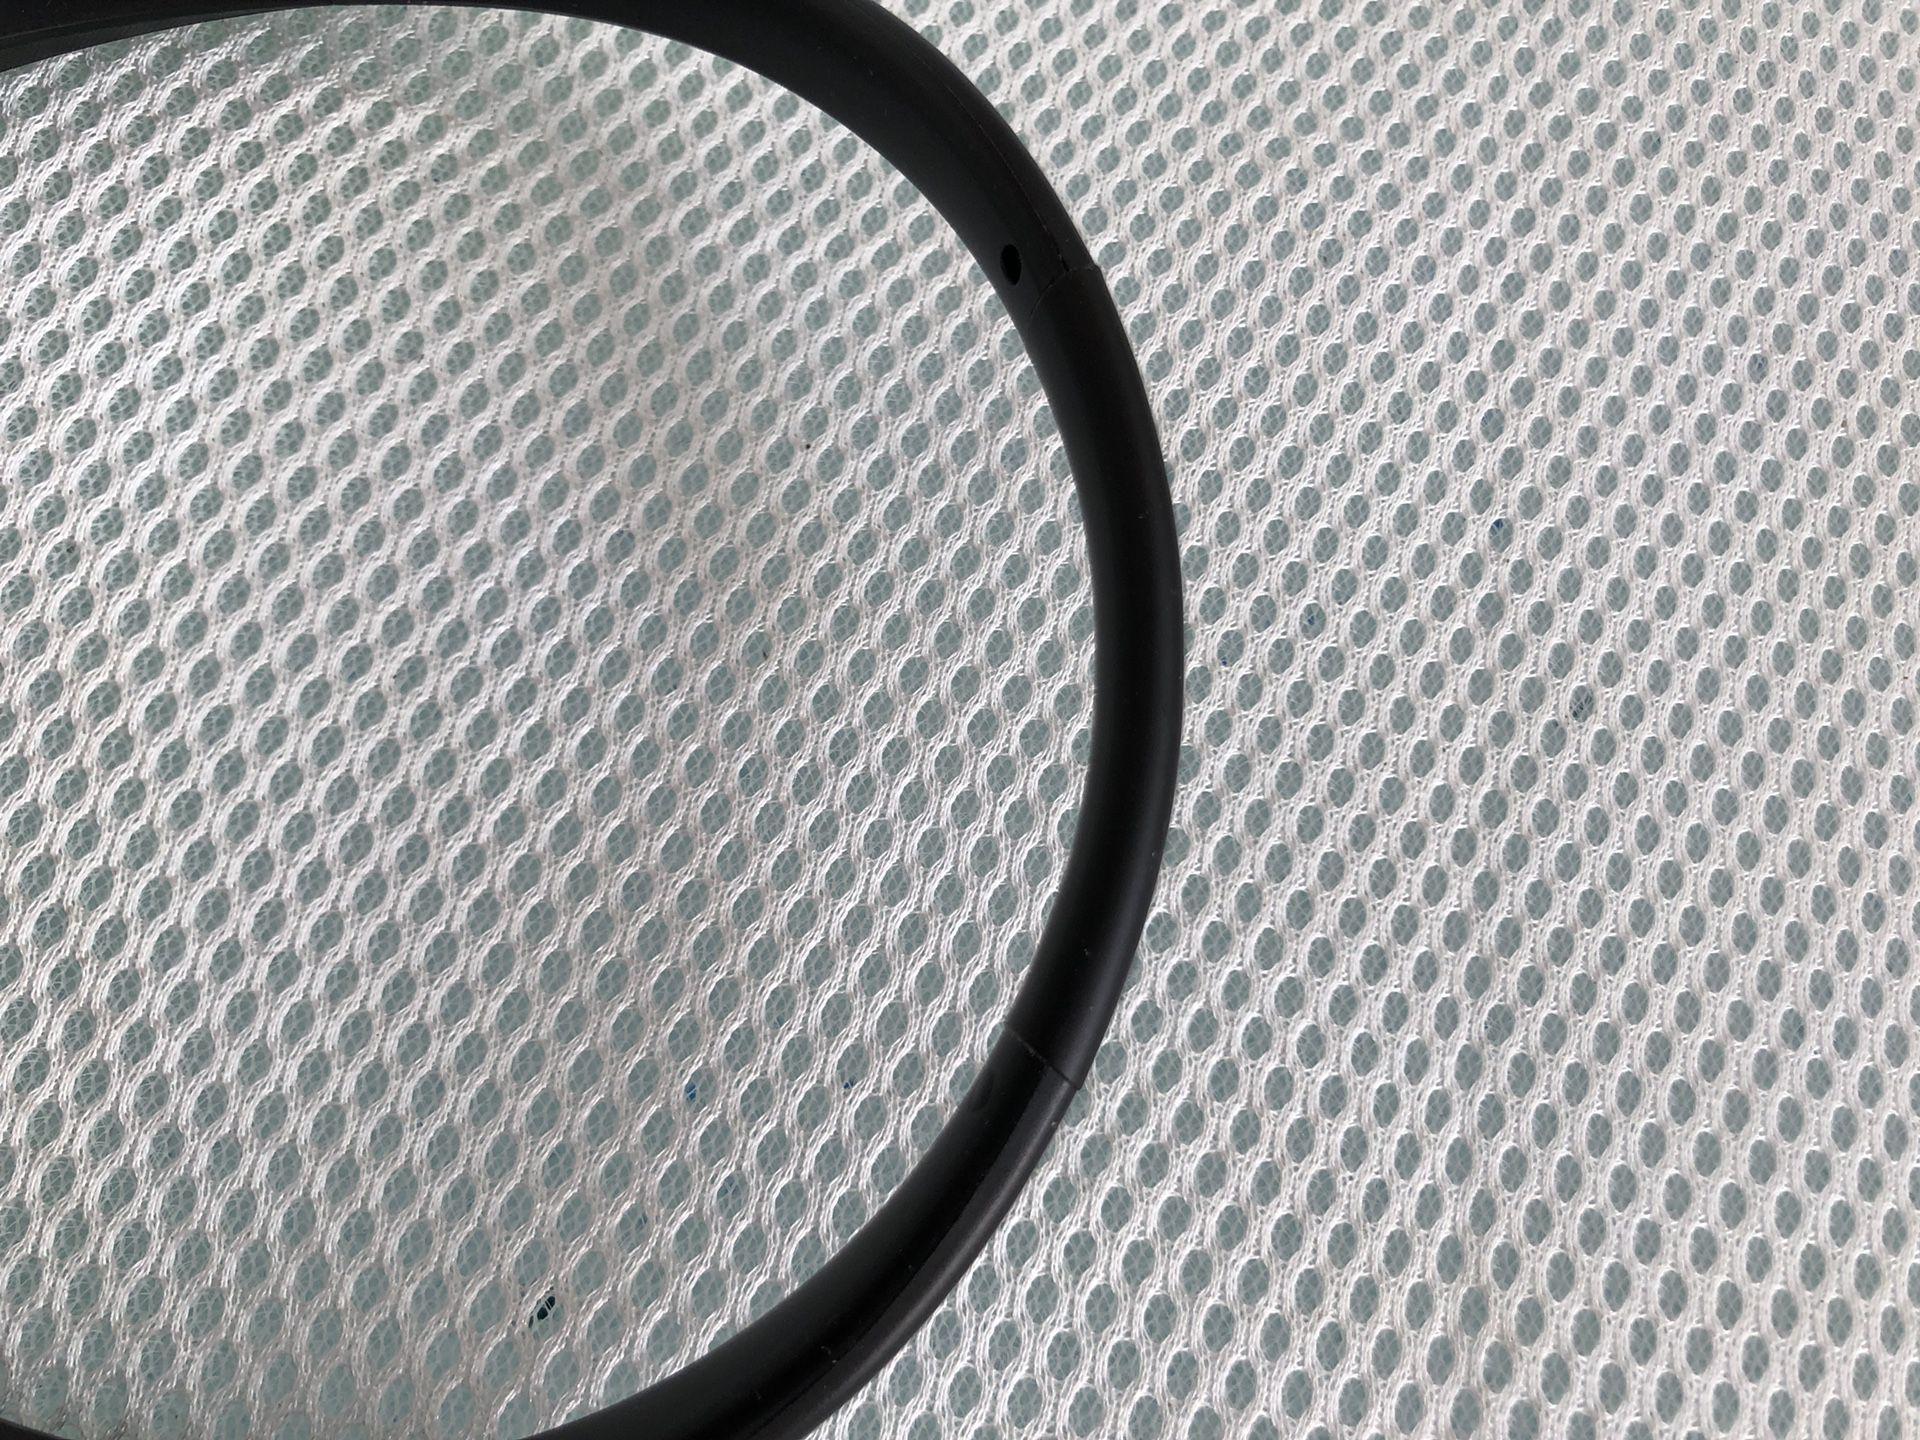 LG 1100 Bluetooth headset